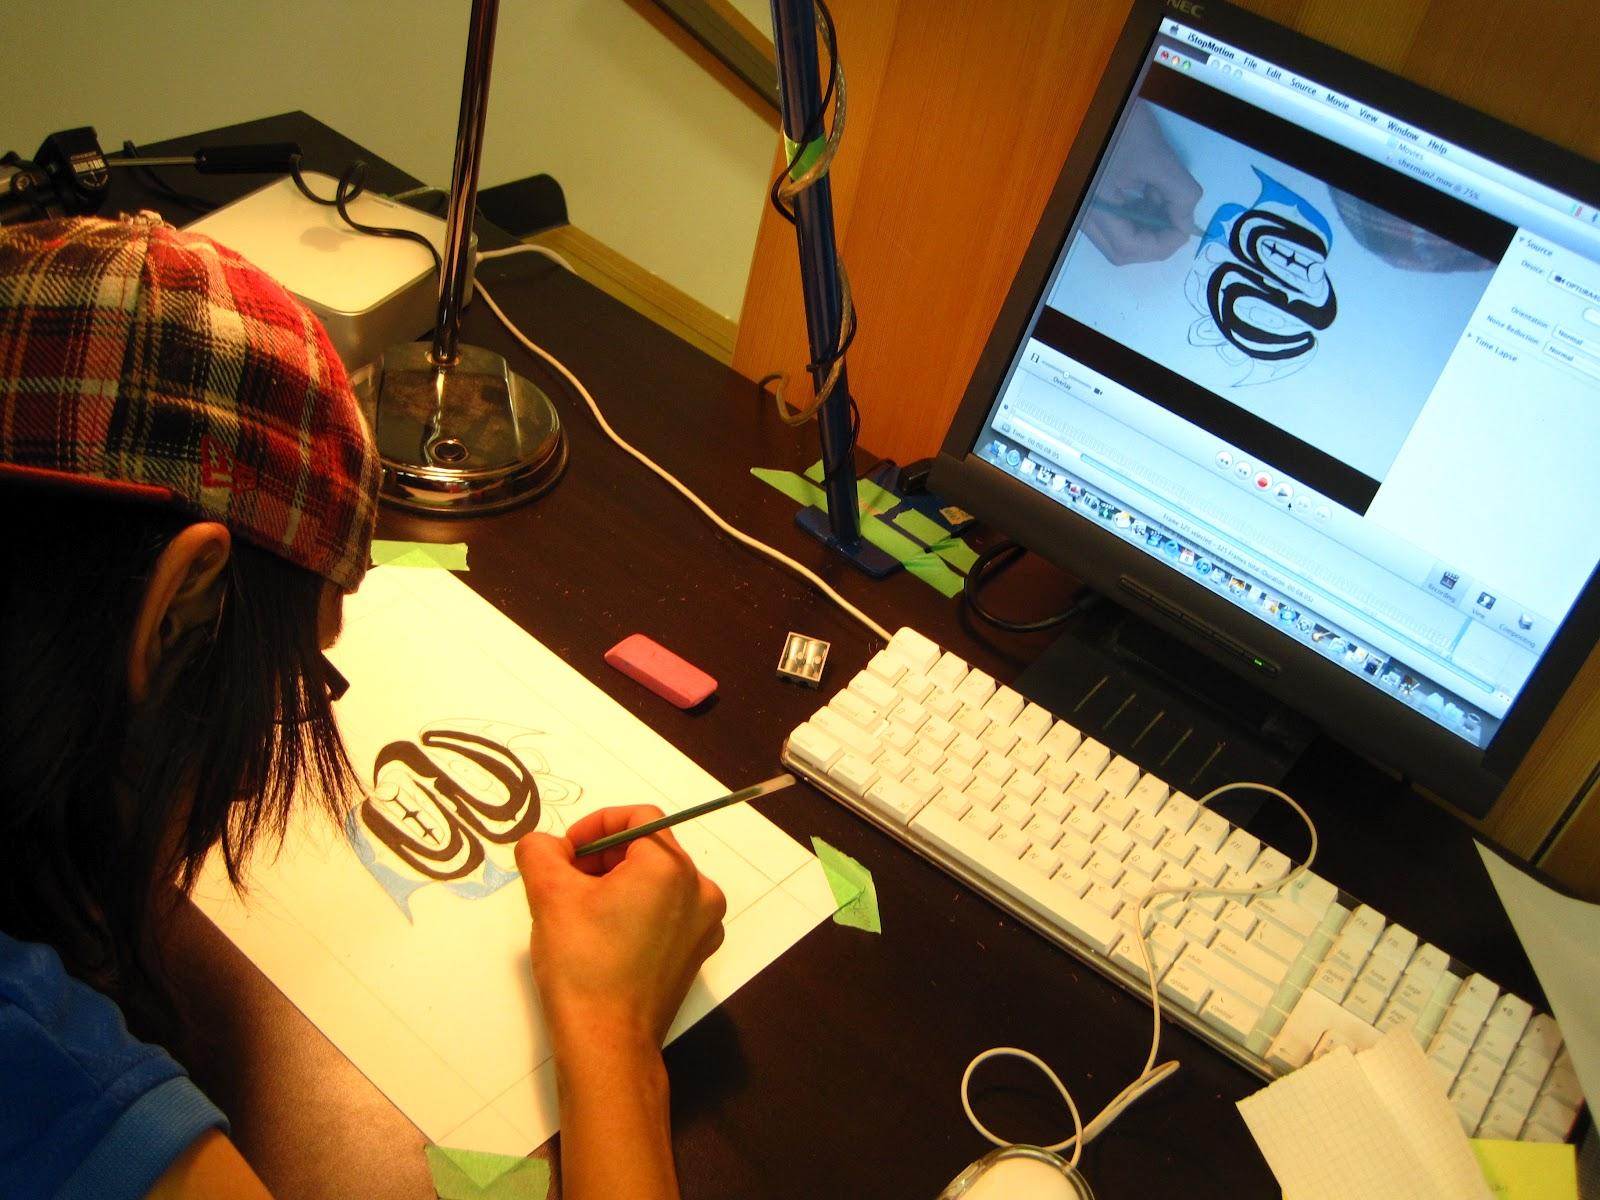 Sherman painting at his animation station